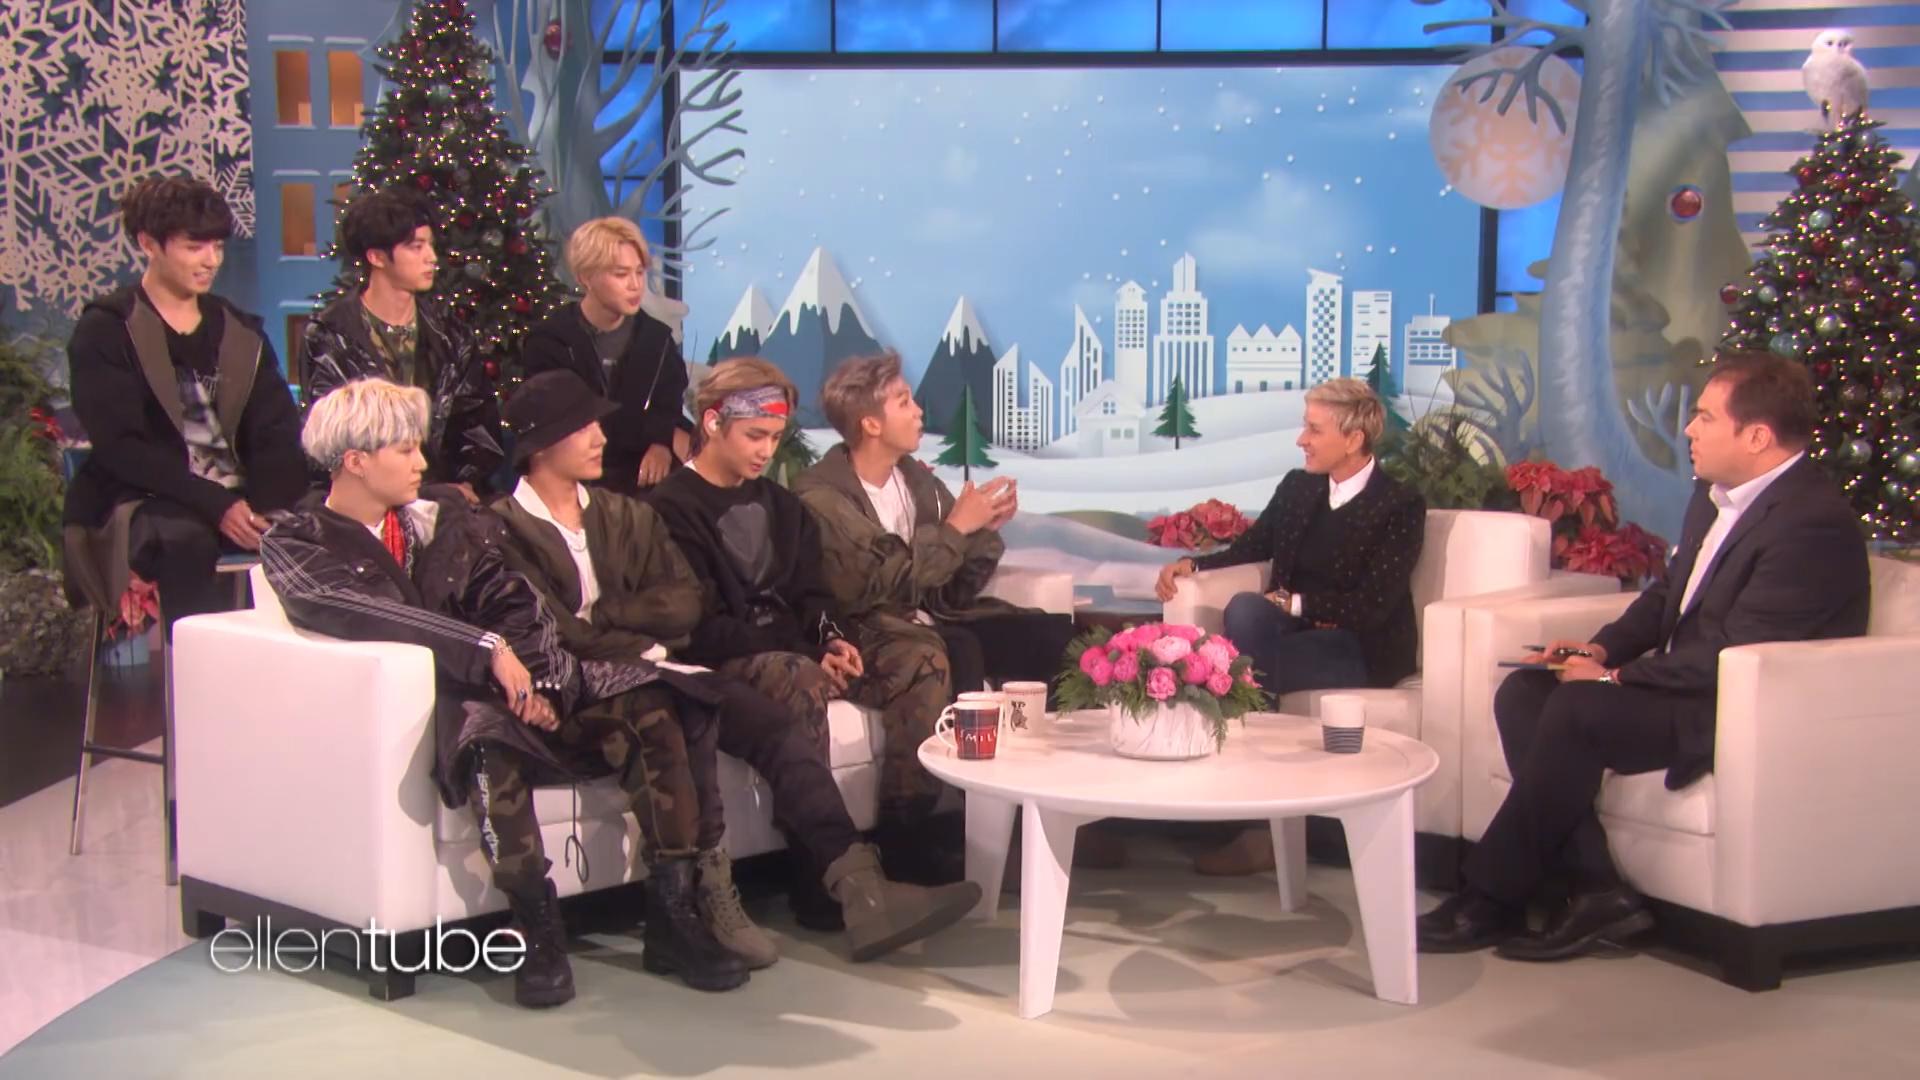 [1] BTS - Ellen show